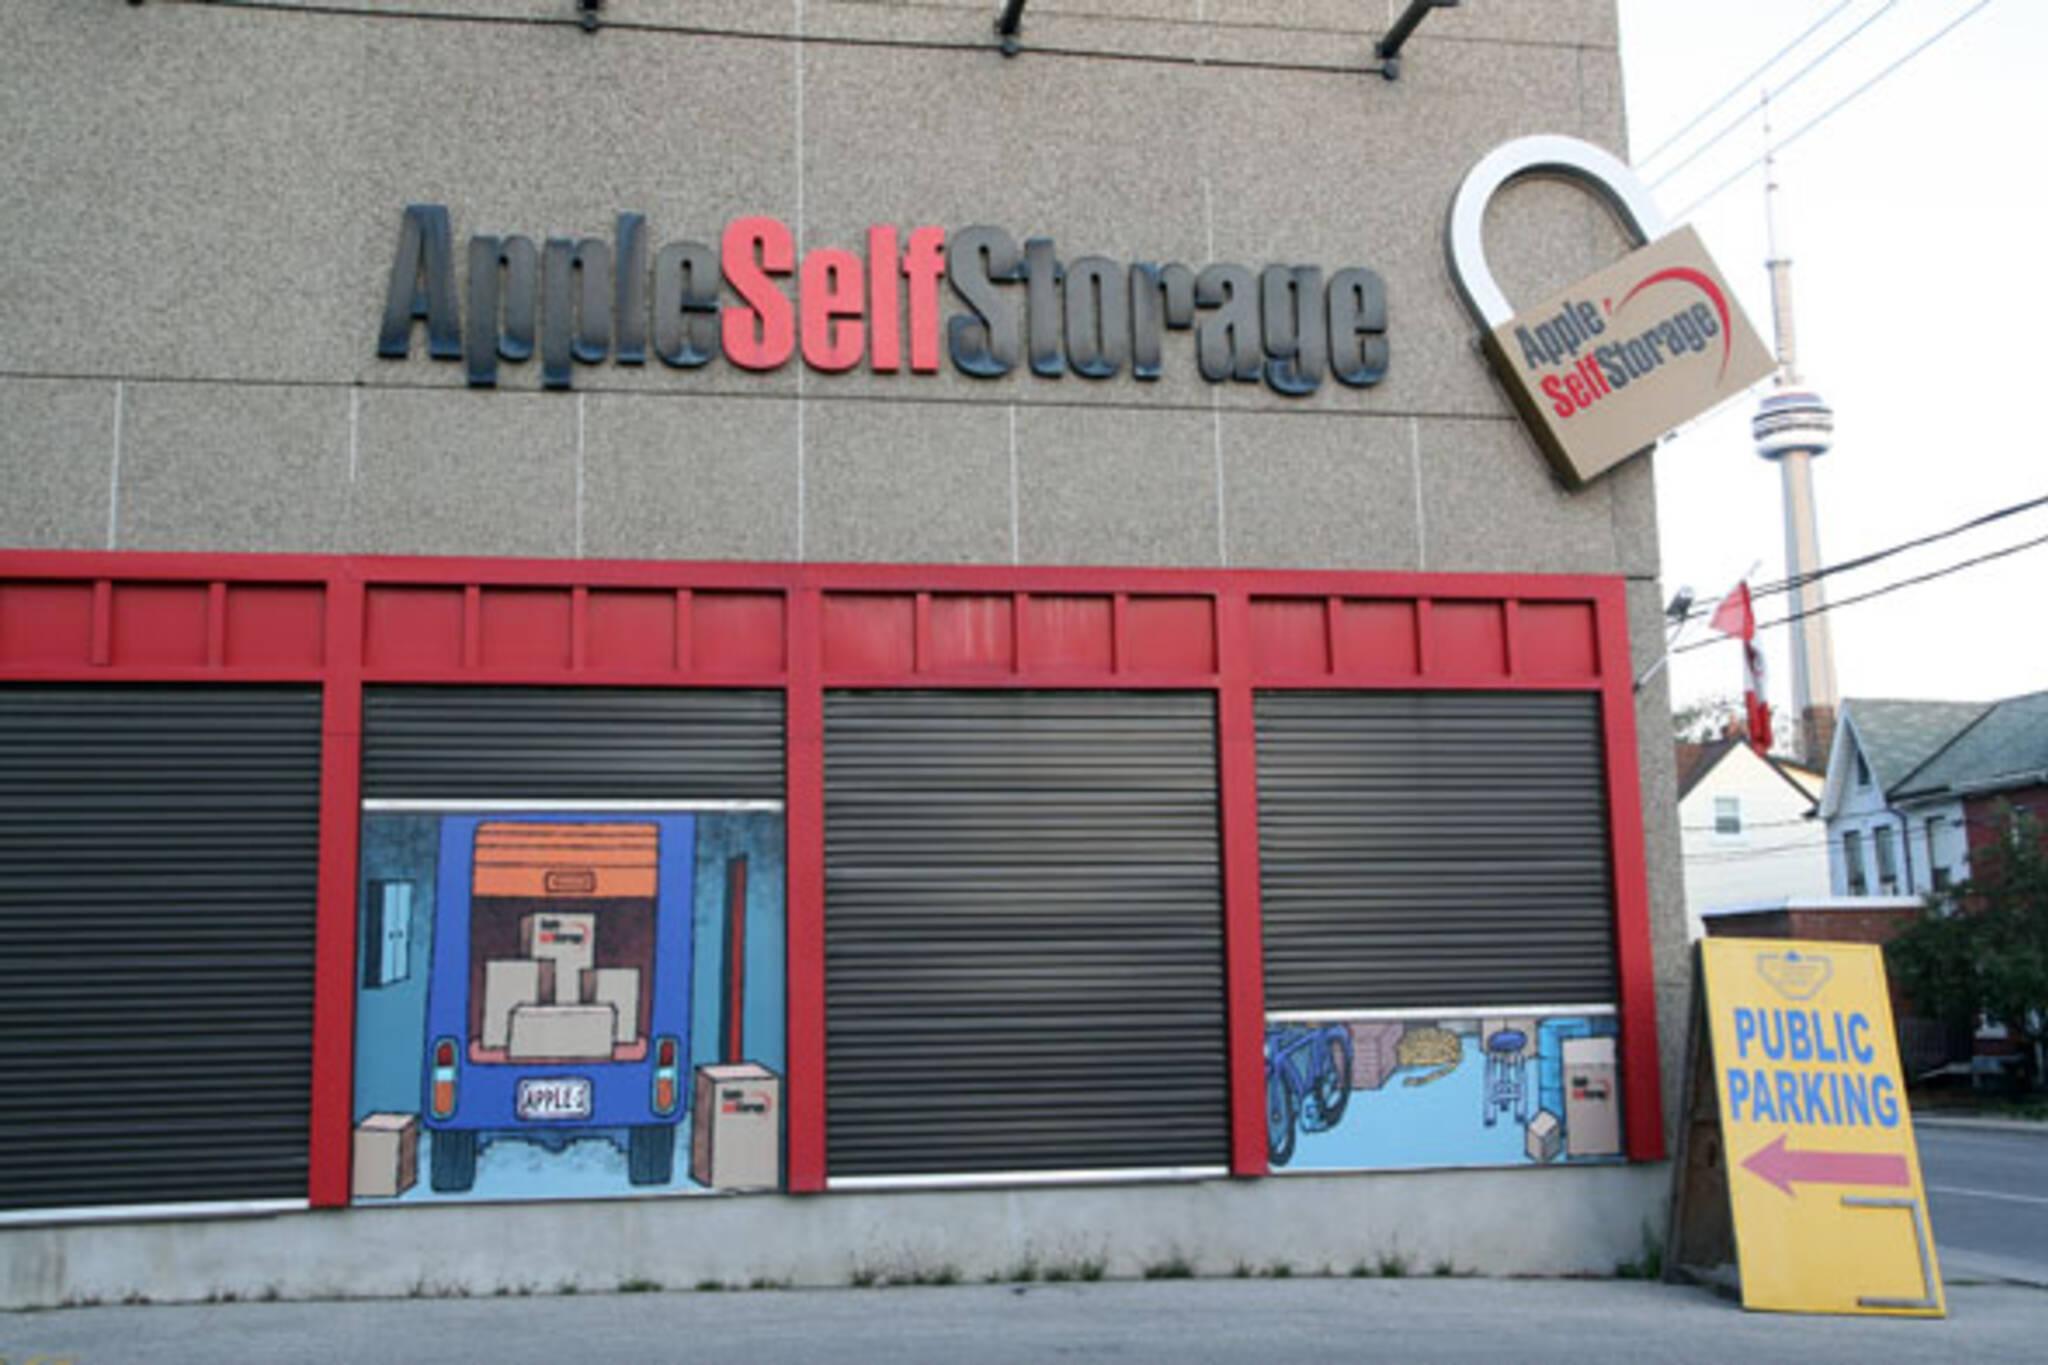 Apple Self Storage